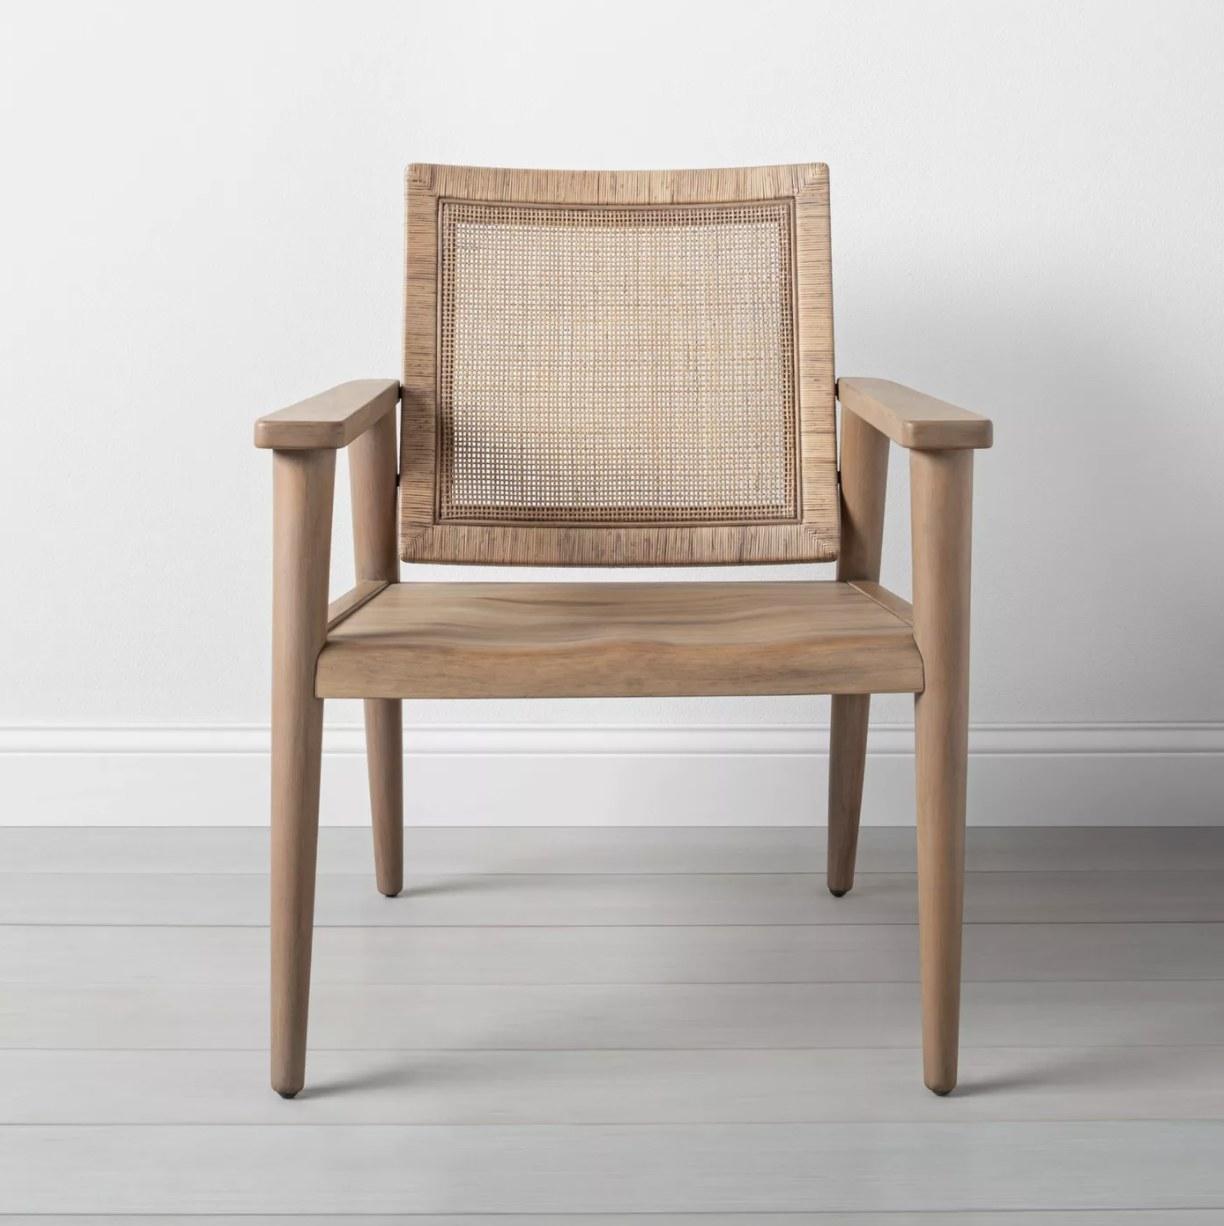 Modern chair sitting in a clean room